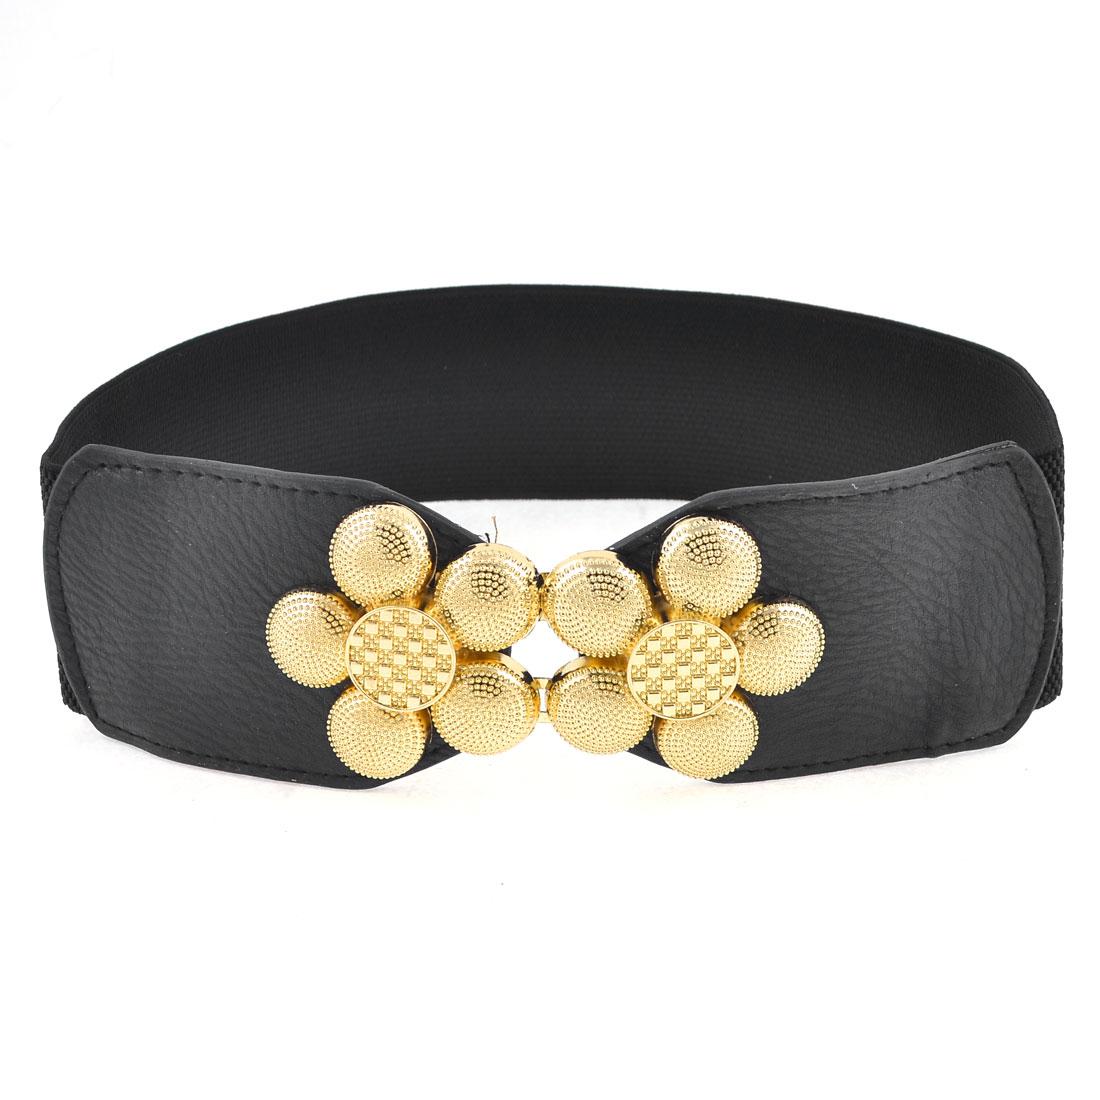 Gold Tone Flower Shaped Interlocking Buckle Faux Leather Elastic Waist Belt Black